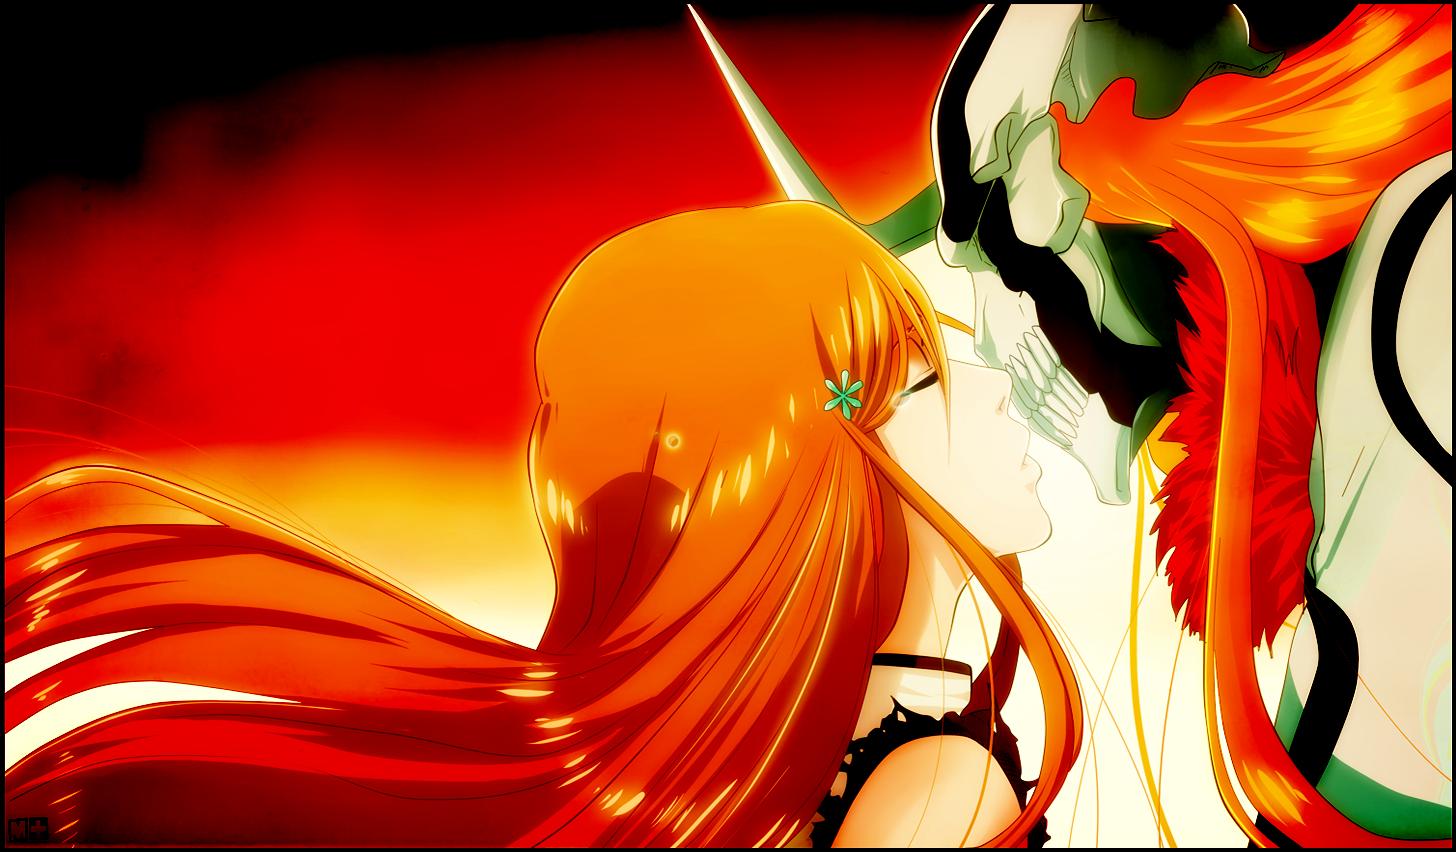 Hollow Ichigo - Zerochan Anime Image Board